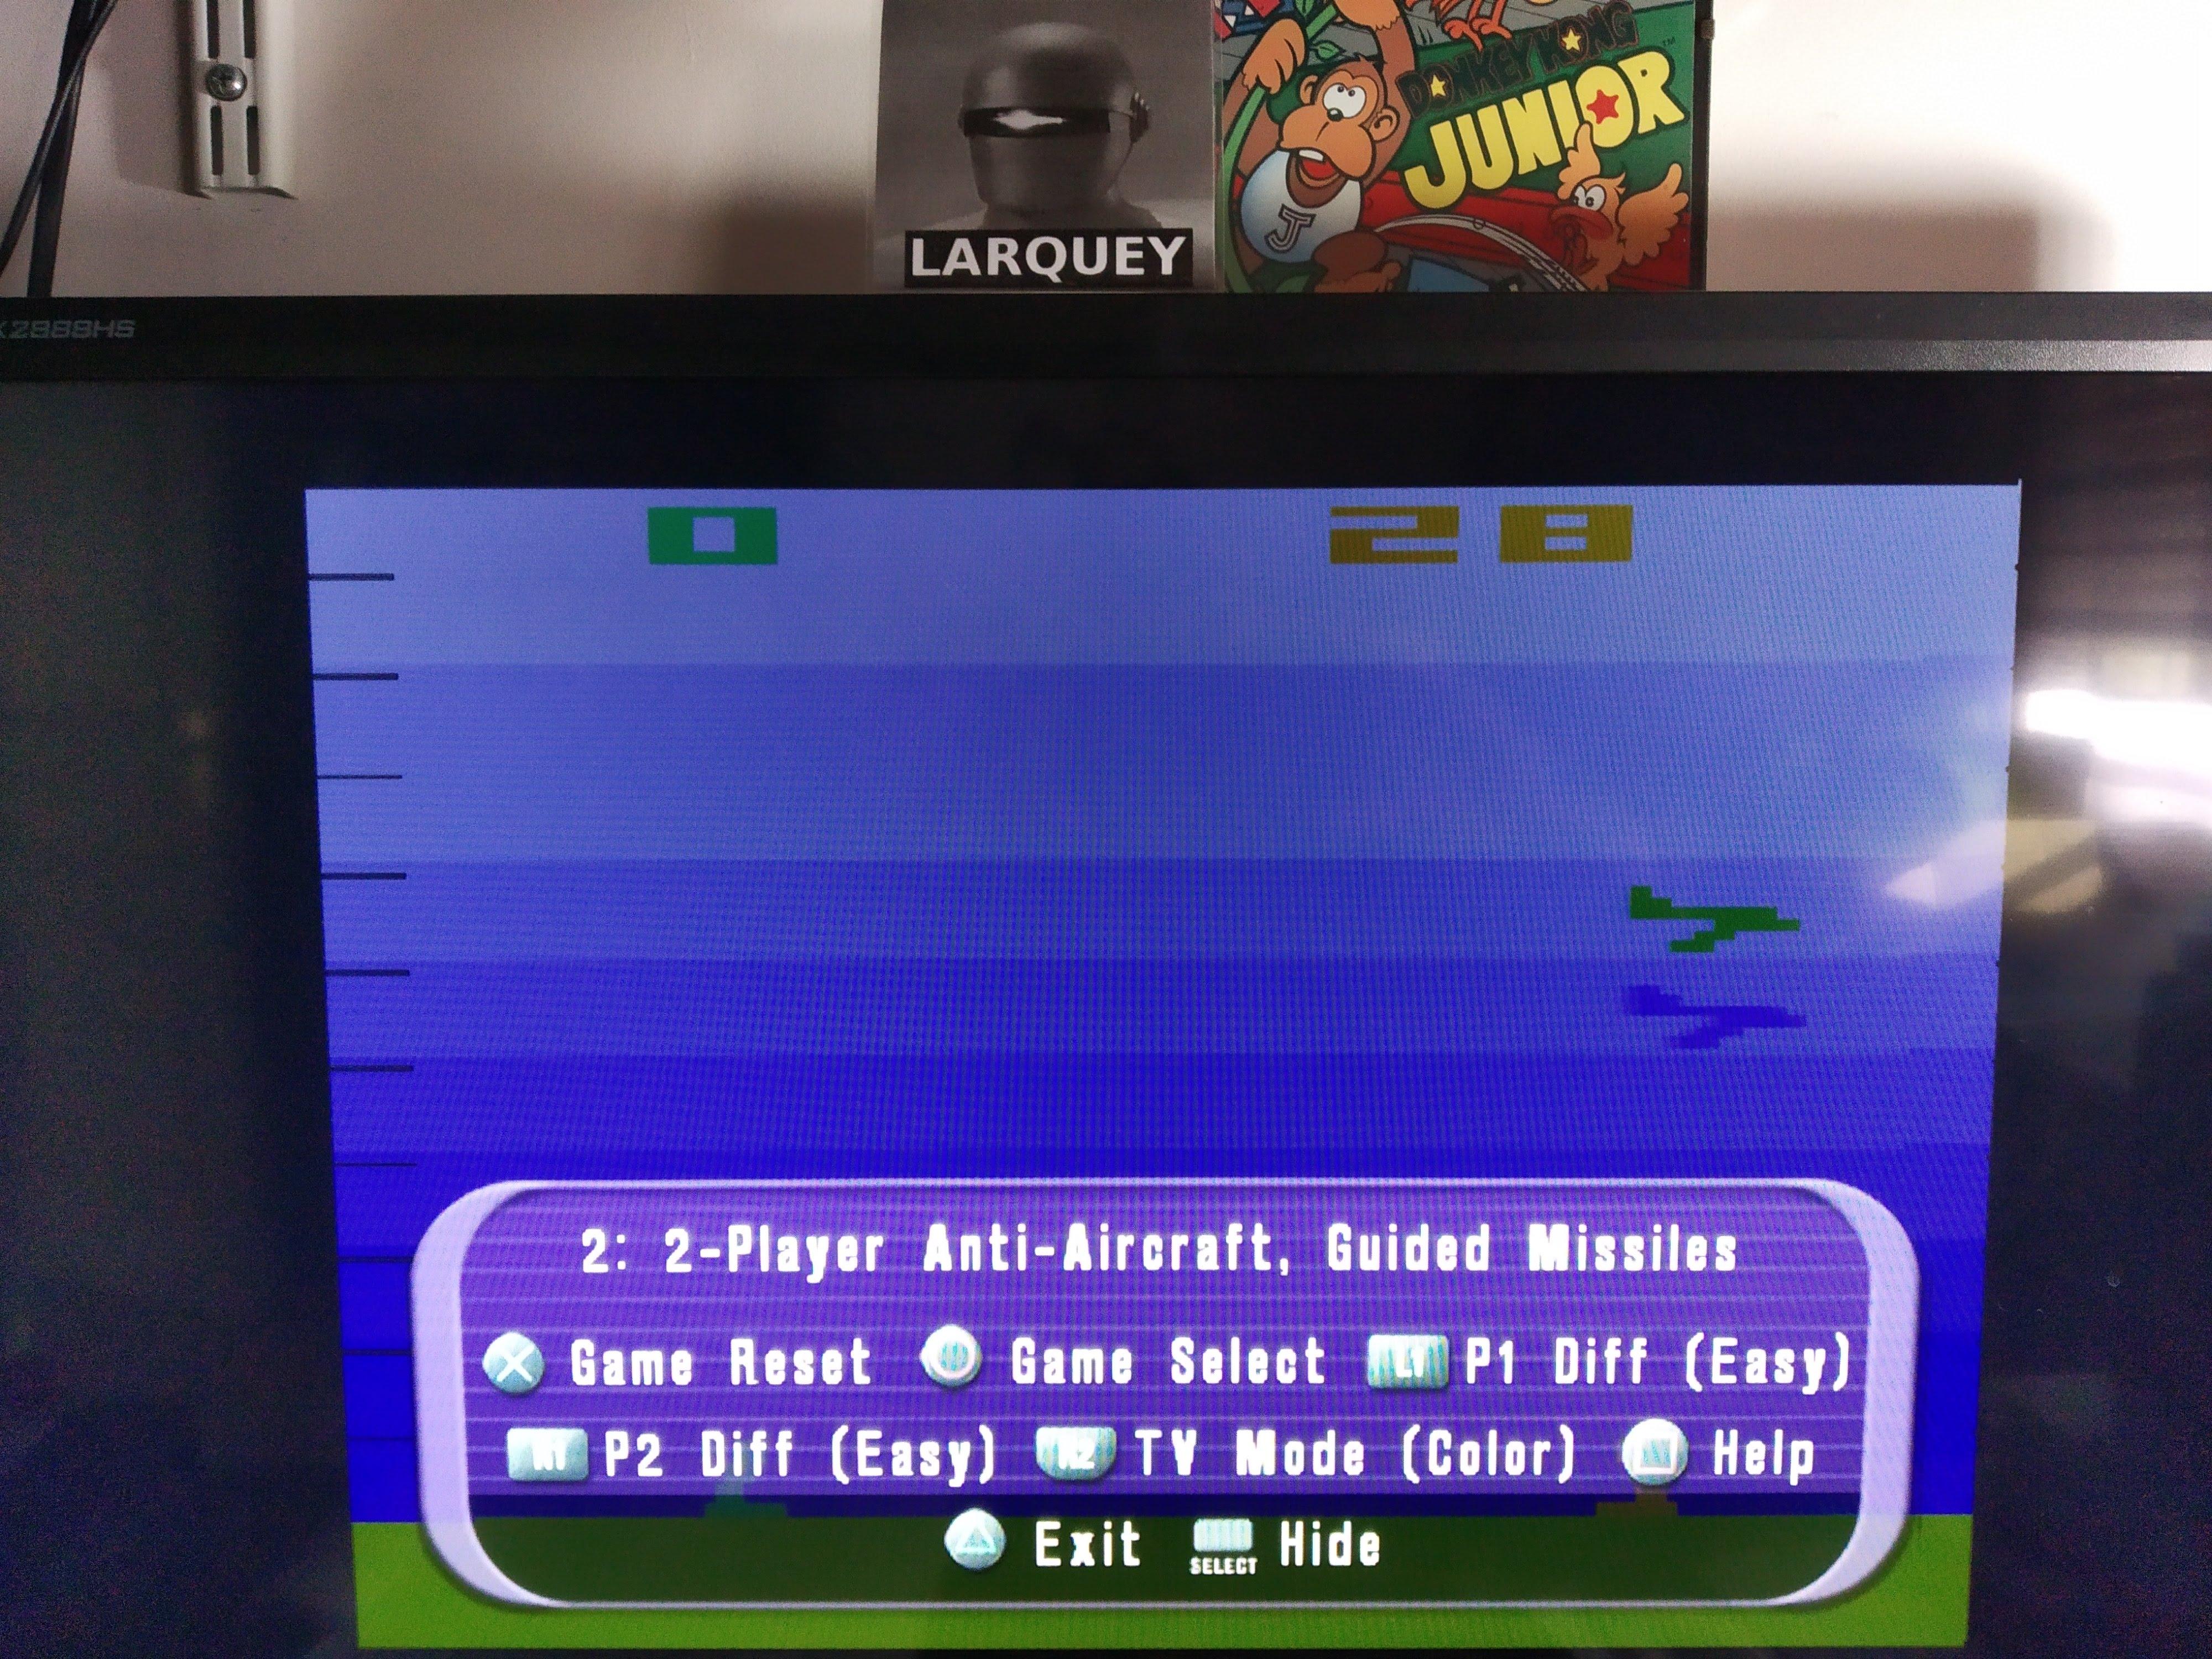 Larquey: Atari Anthology: Air-Sea Battle [Game 2B] (Playstation 2 Emulated) 28 points on 2020-08-05 12:10:00